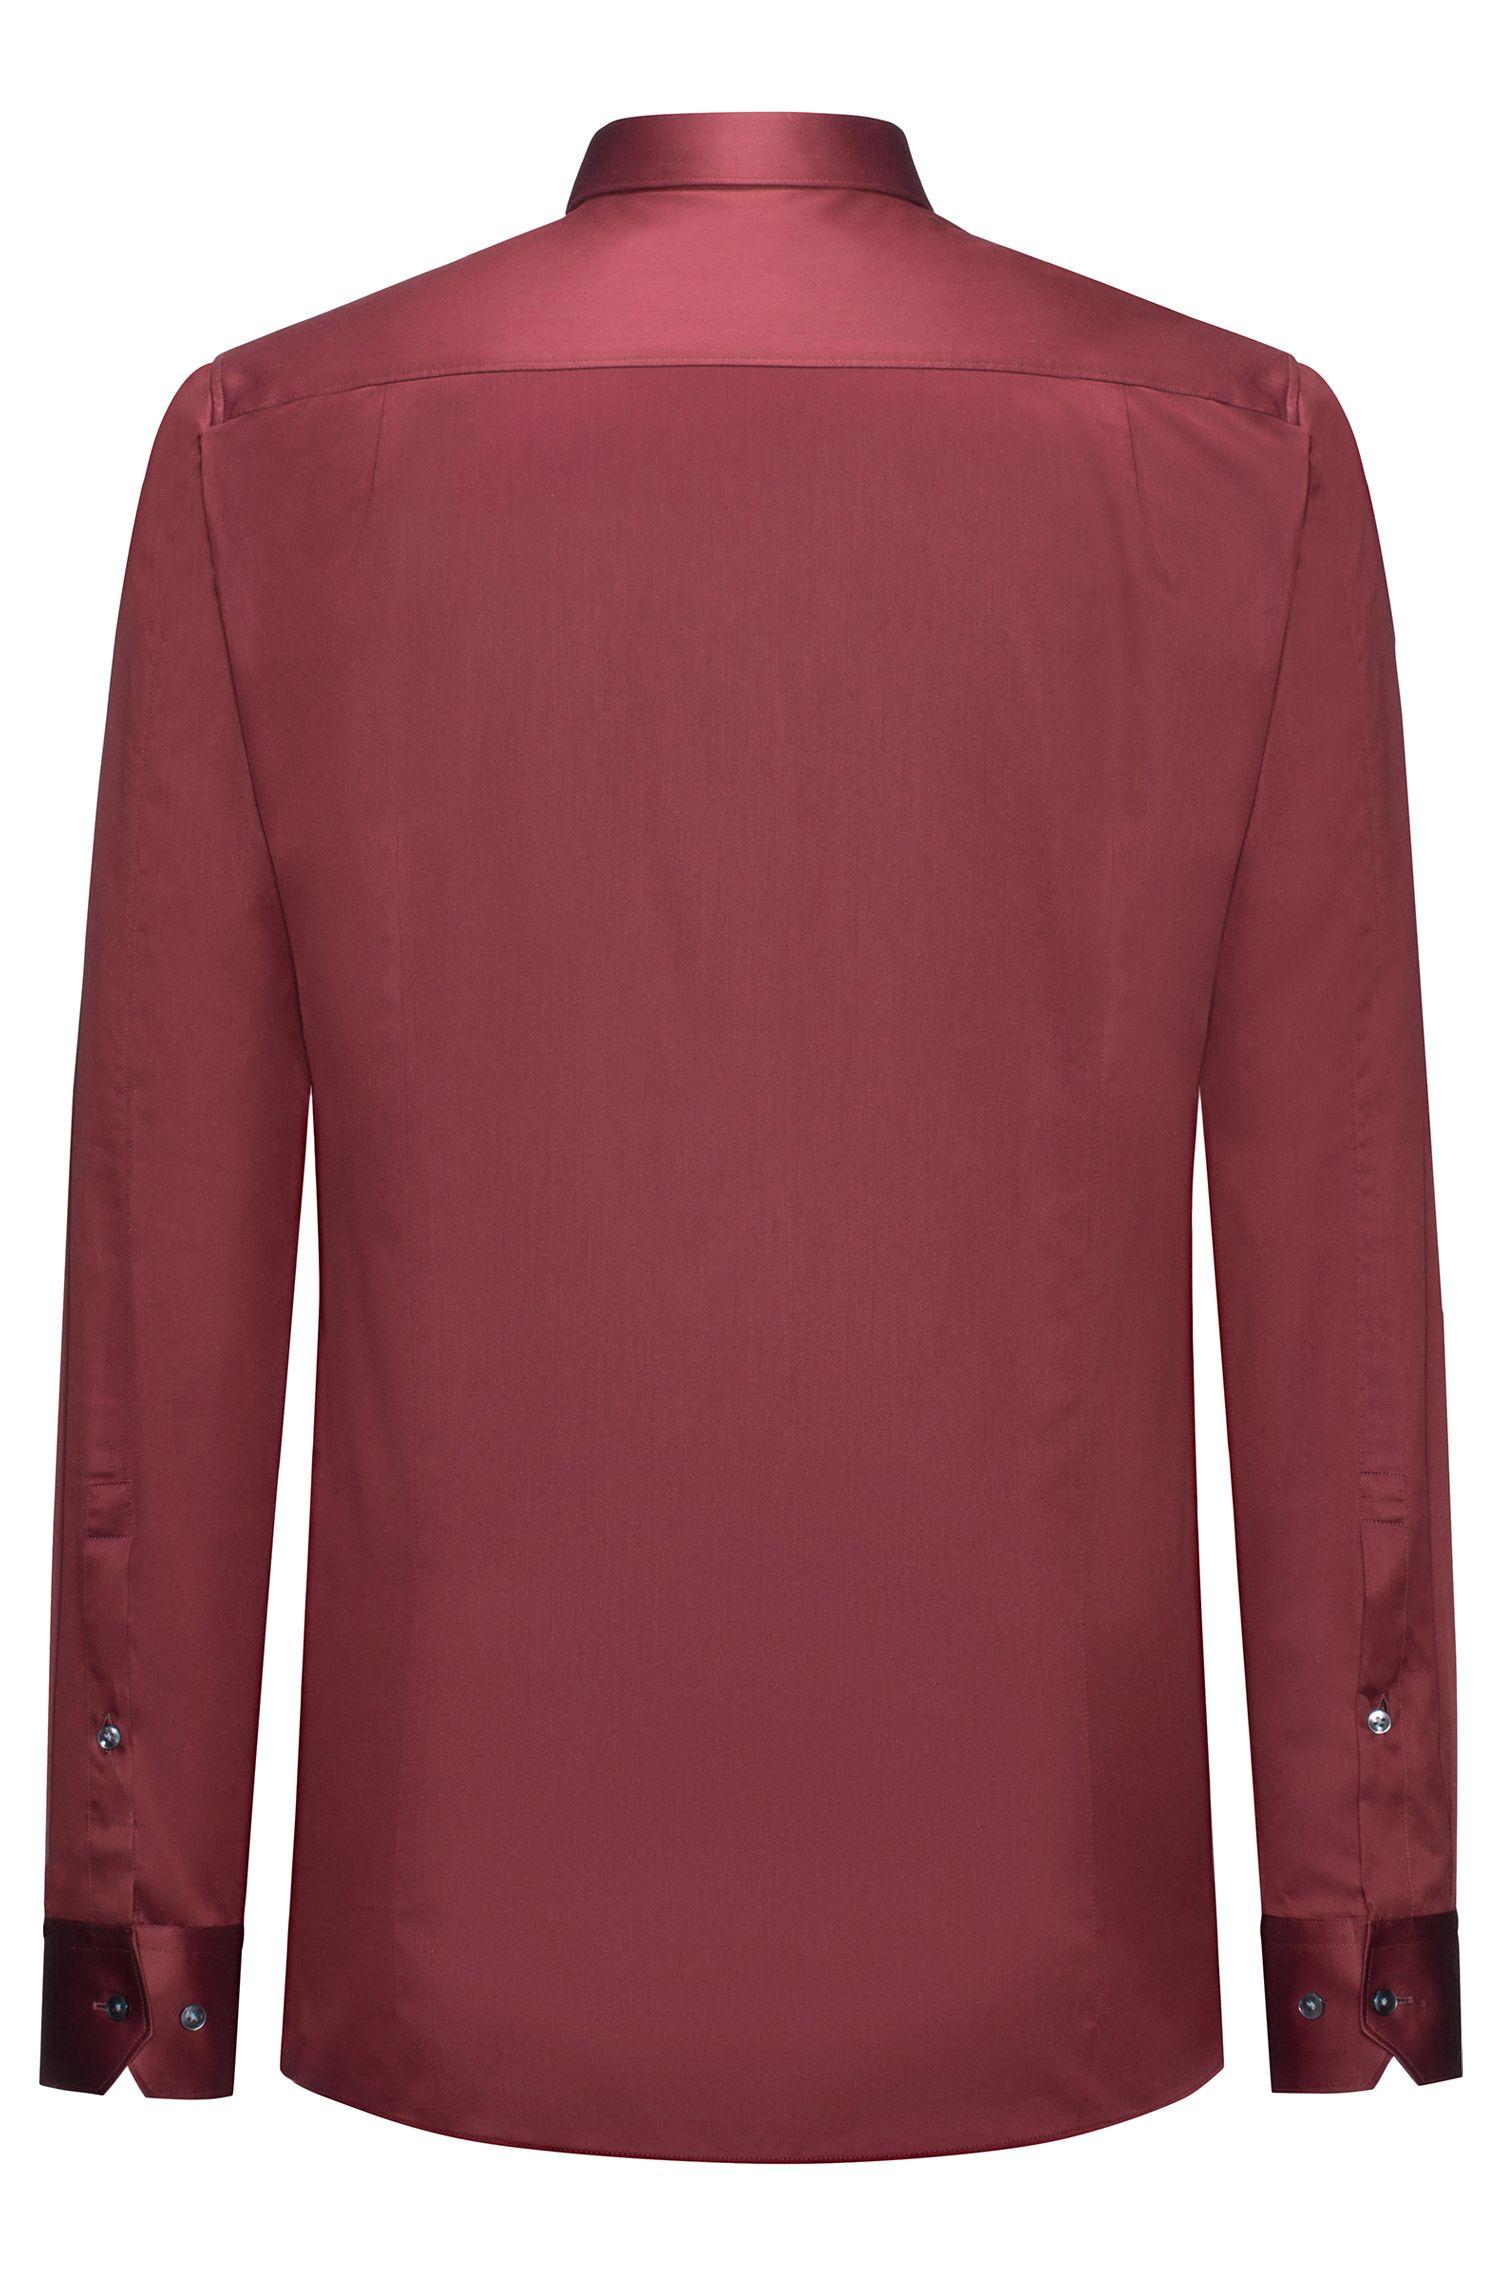 Two-Ply Cotton Dress Shirt, Extra Slim Fit | Elisha, Dark Red